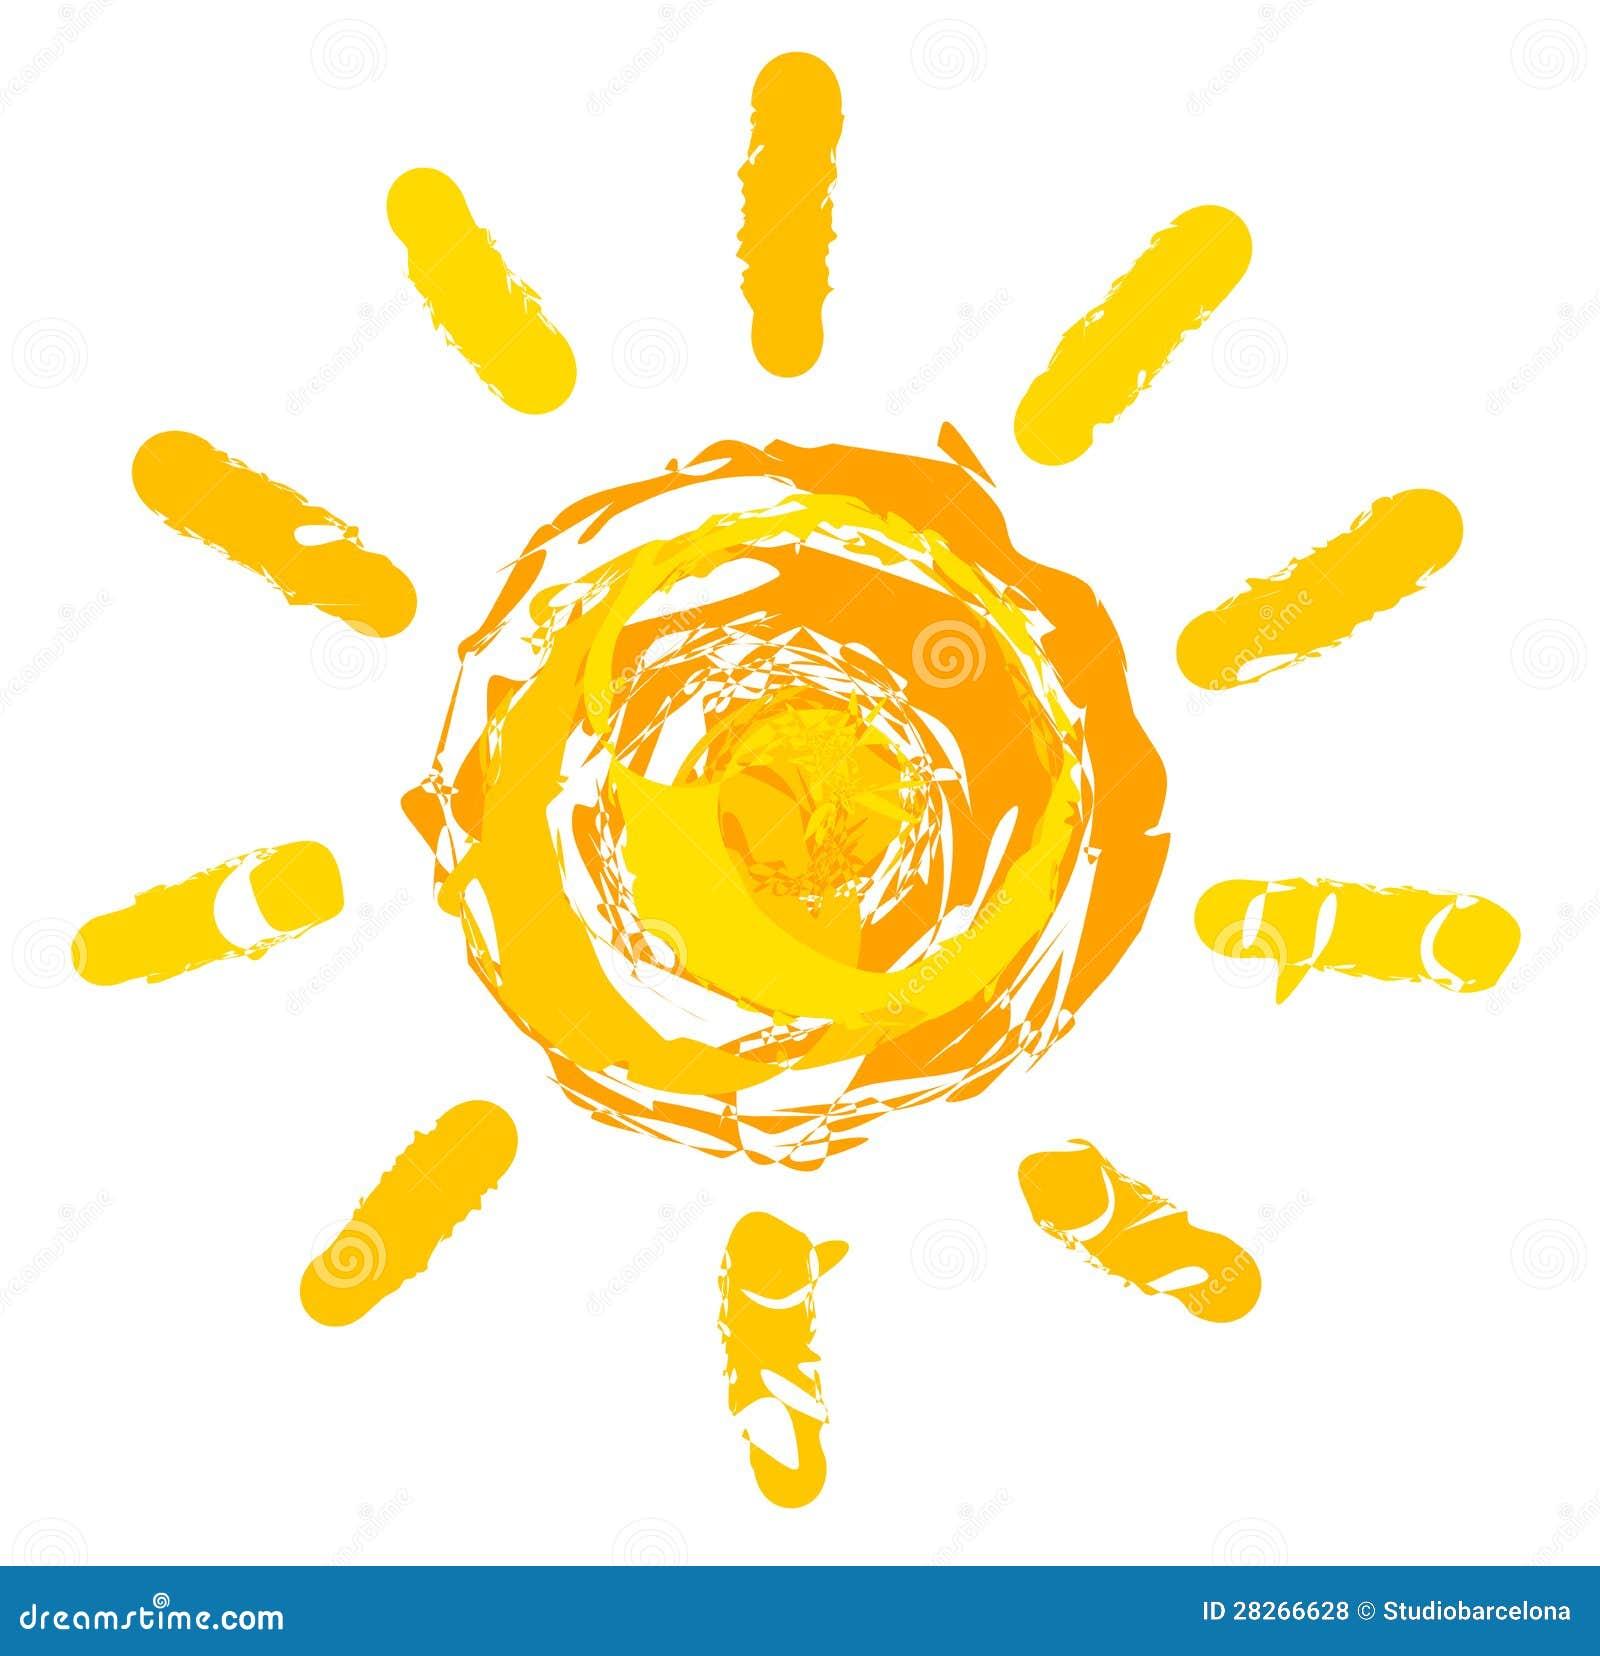 Sun Illustration Royalty Free Stock Photos - Image: 28266628